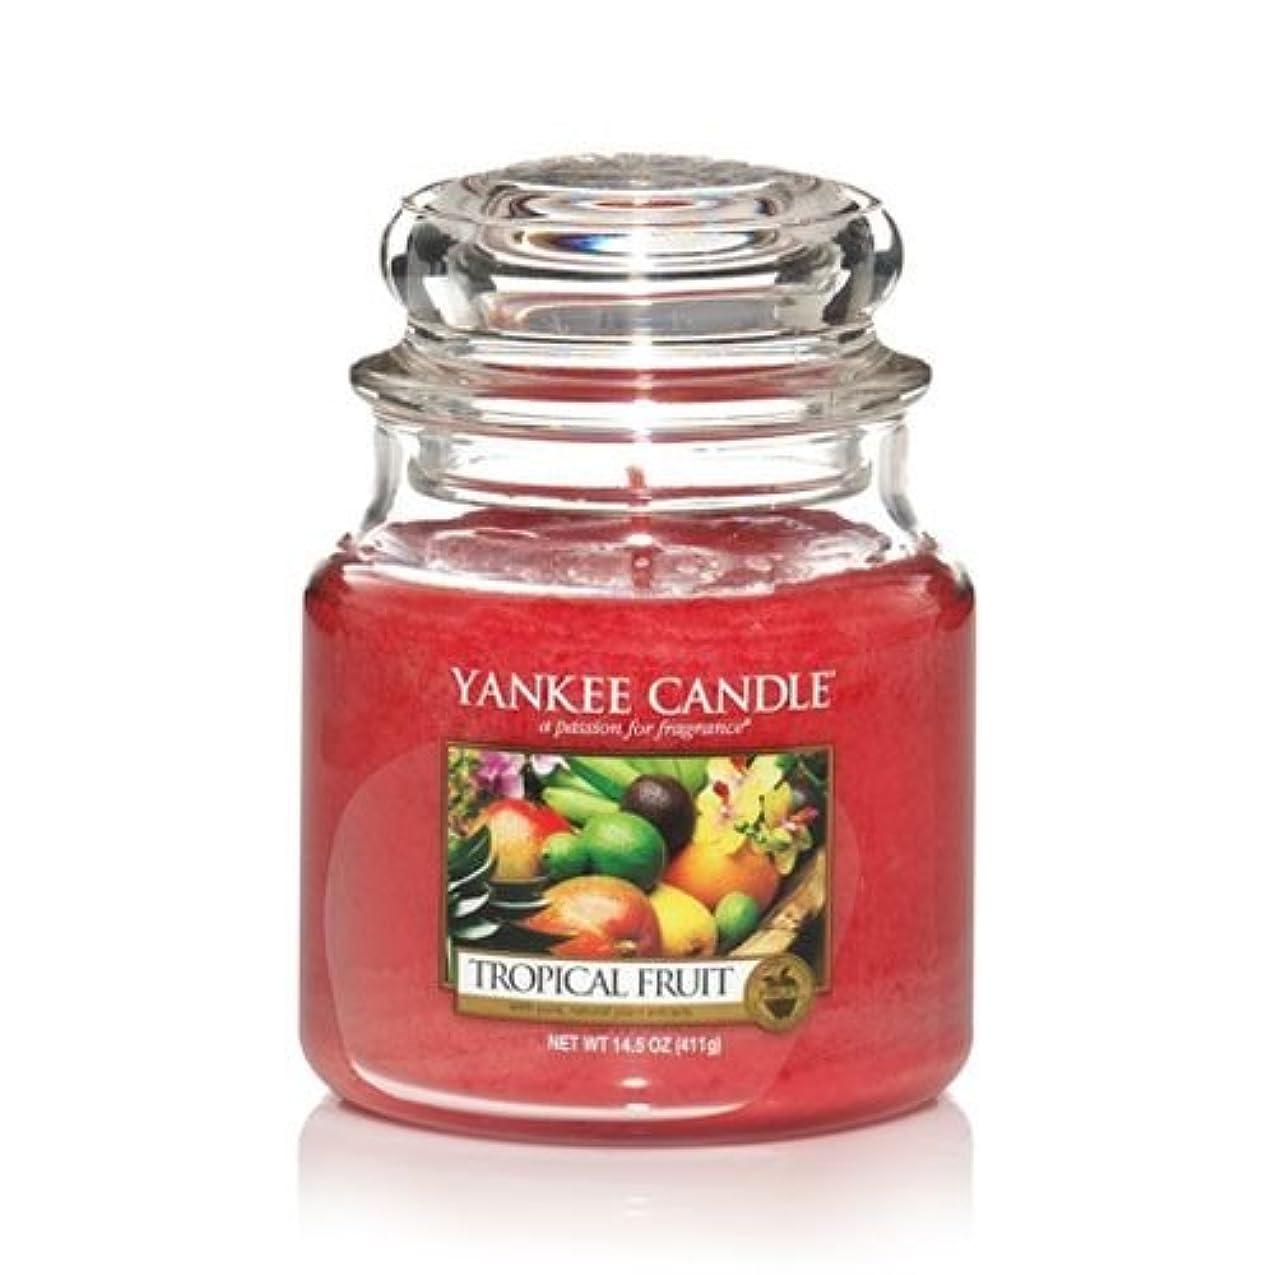 Yankee Candle 14.5 Oz Jar Candleトロピカルフルーツ